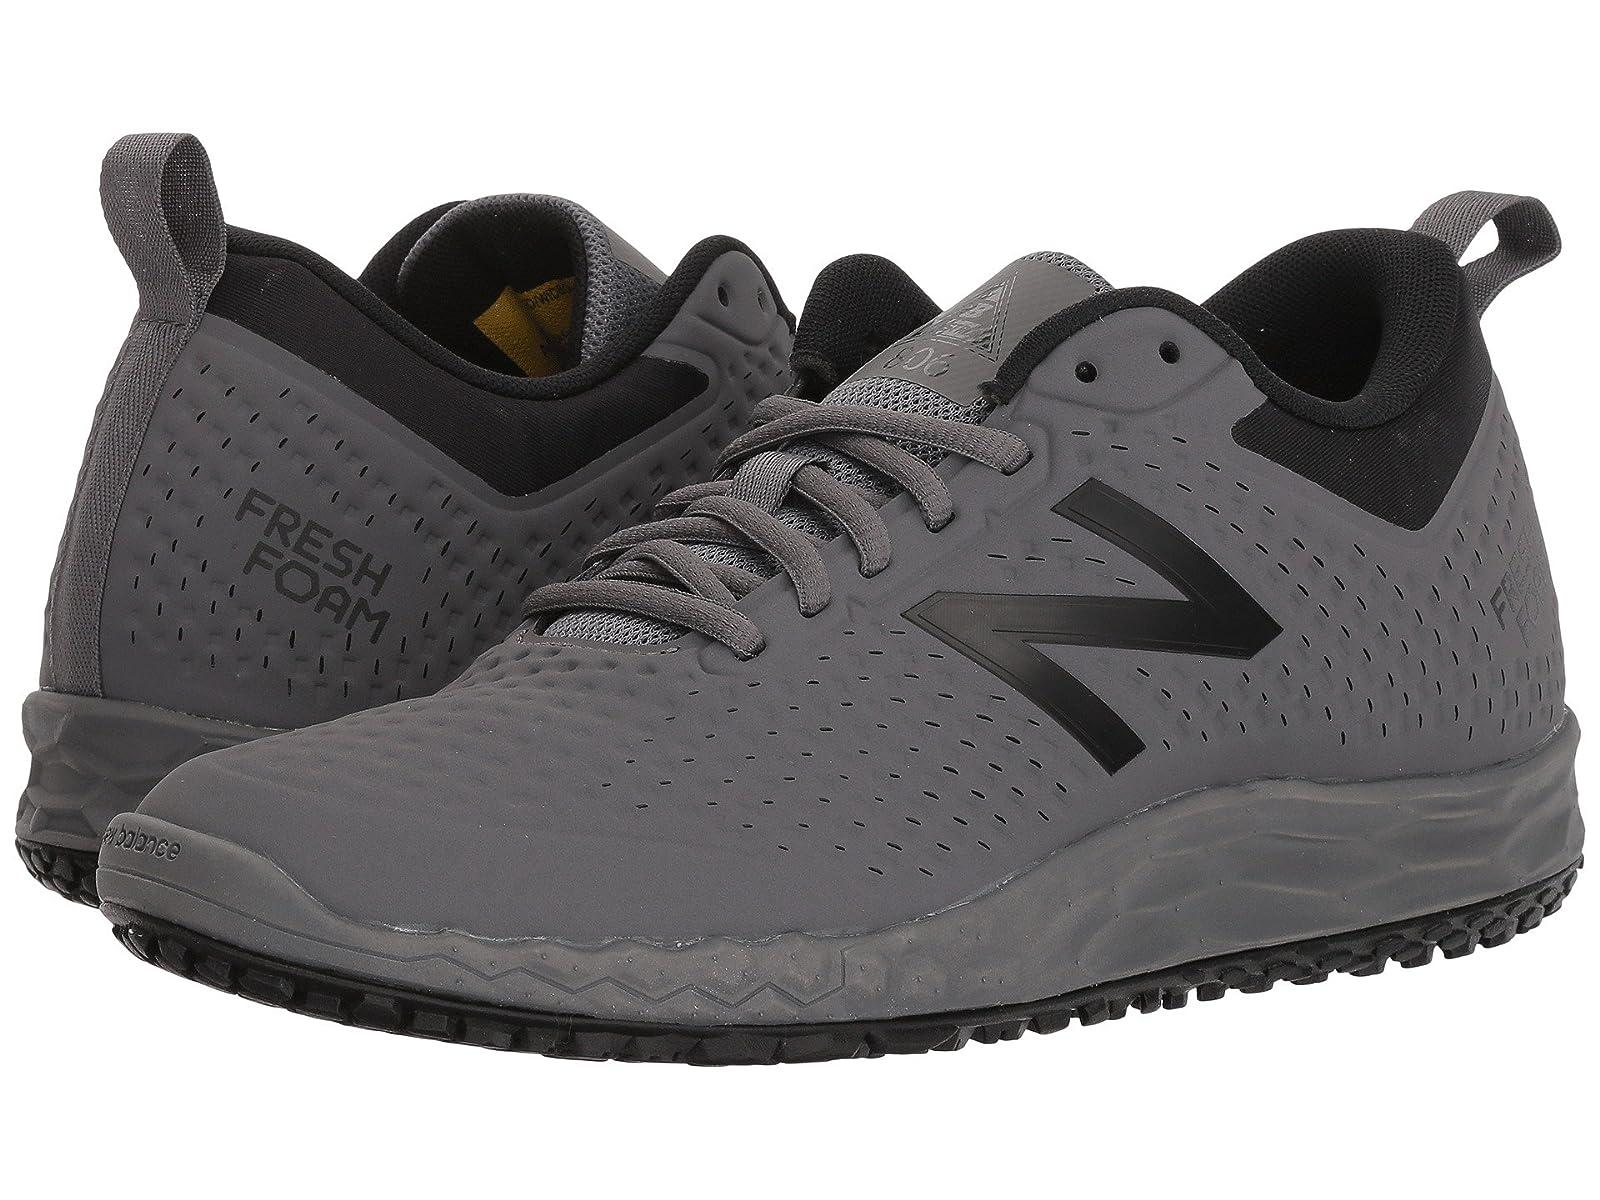 New Balance 806v1Atmospheric grades have affordable shoes